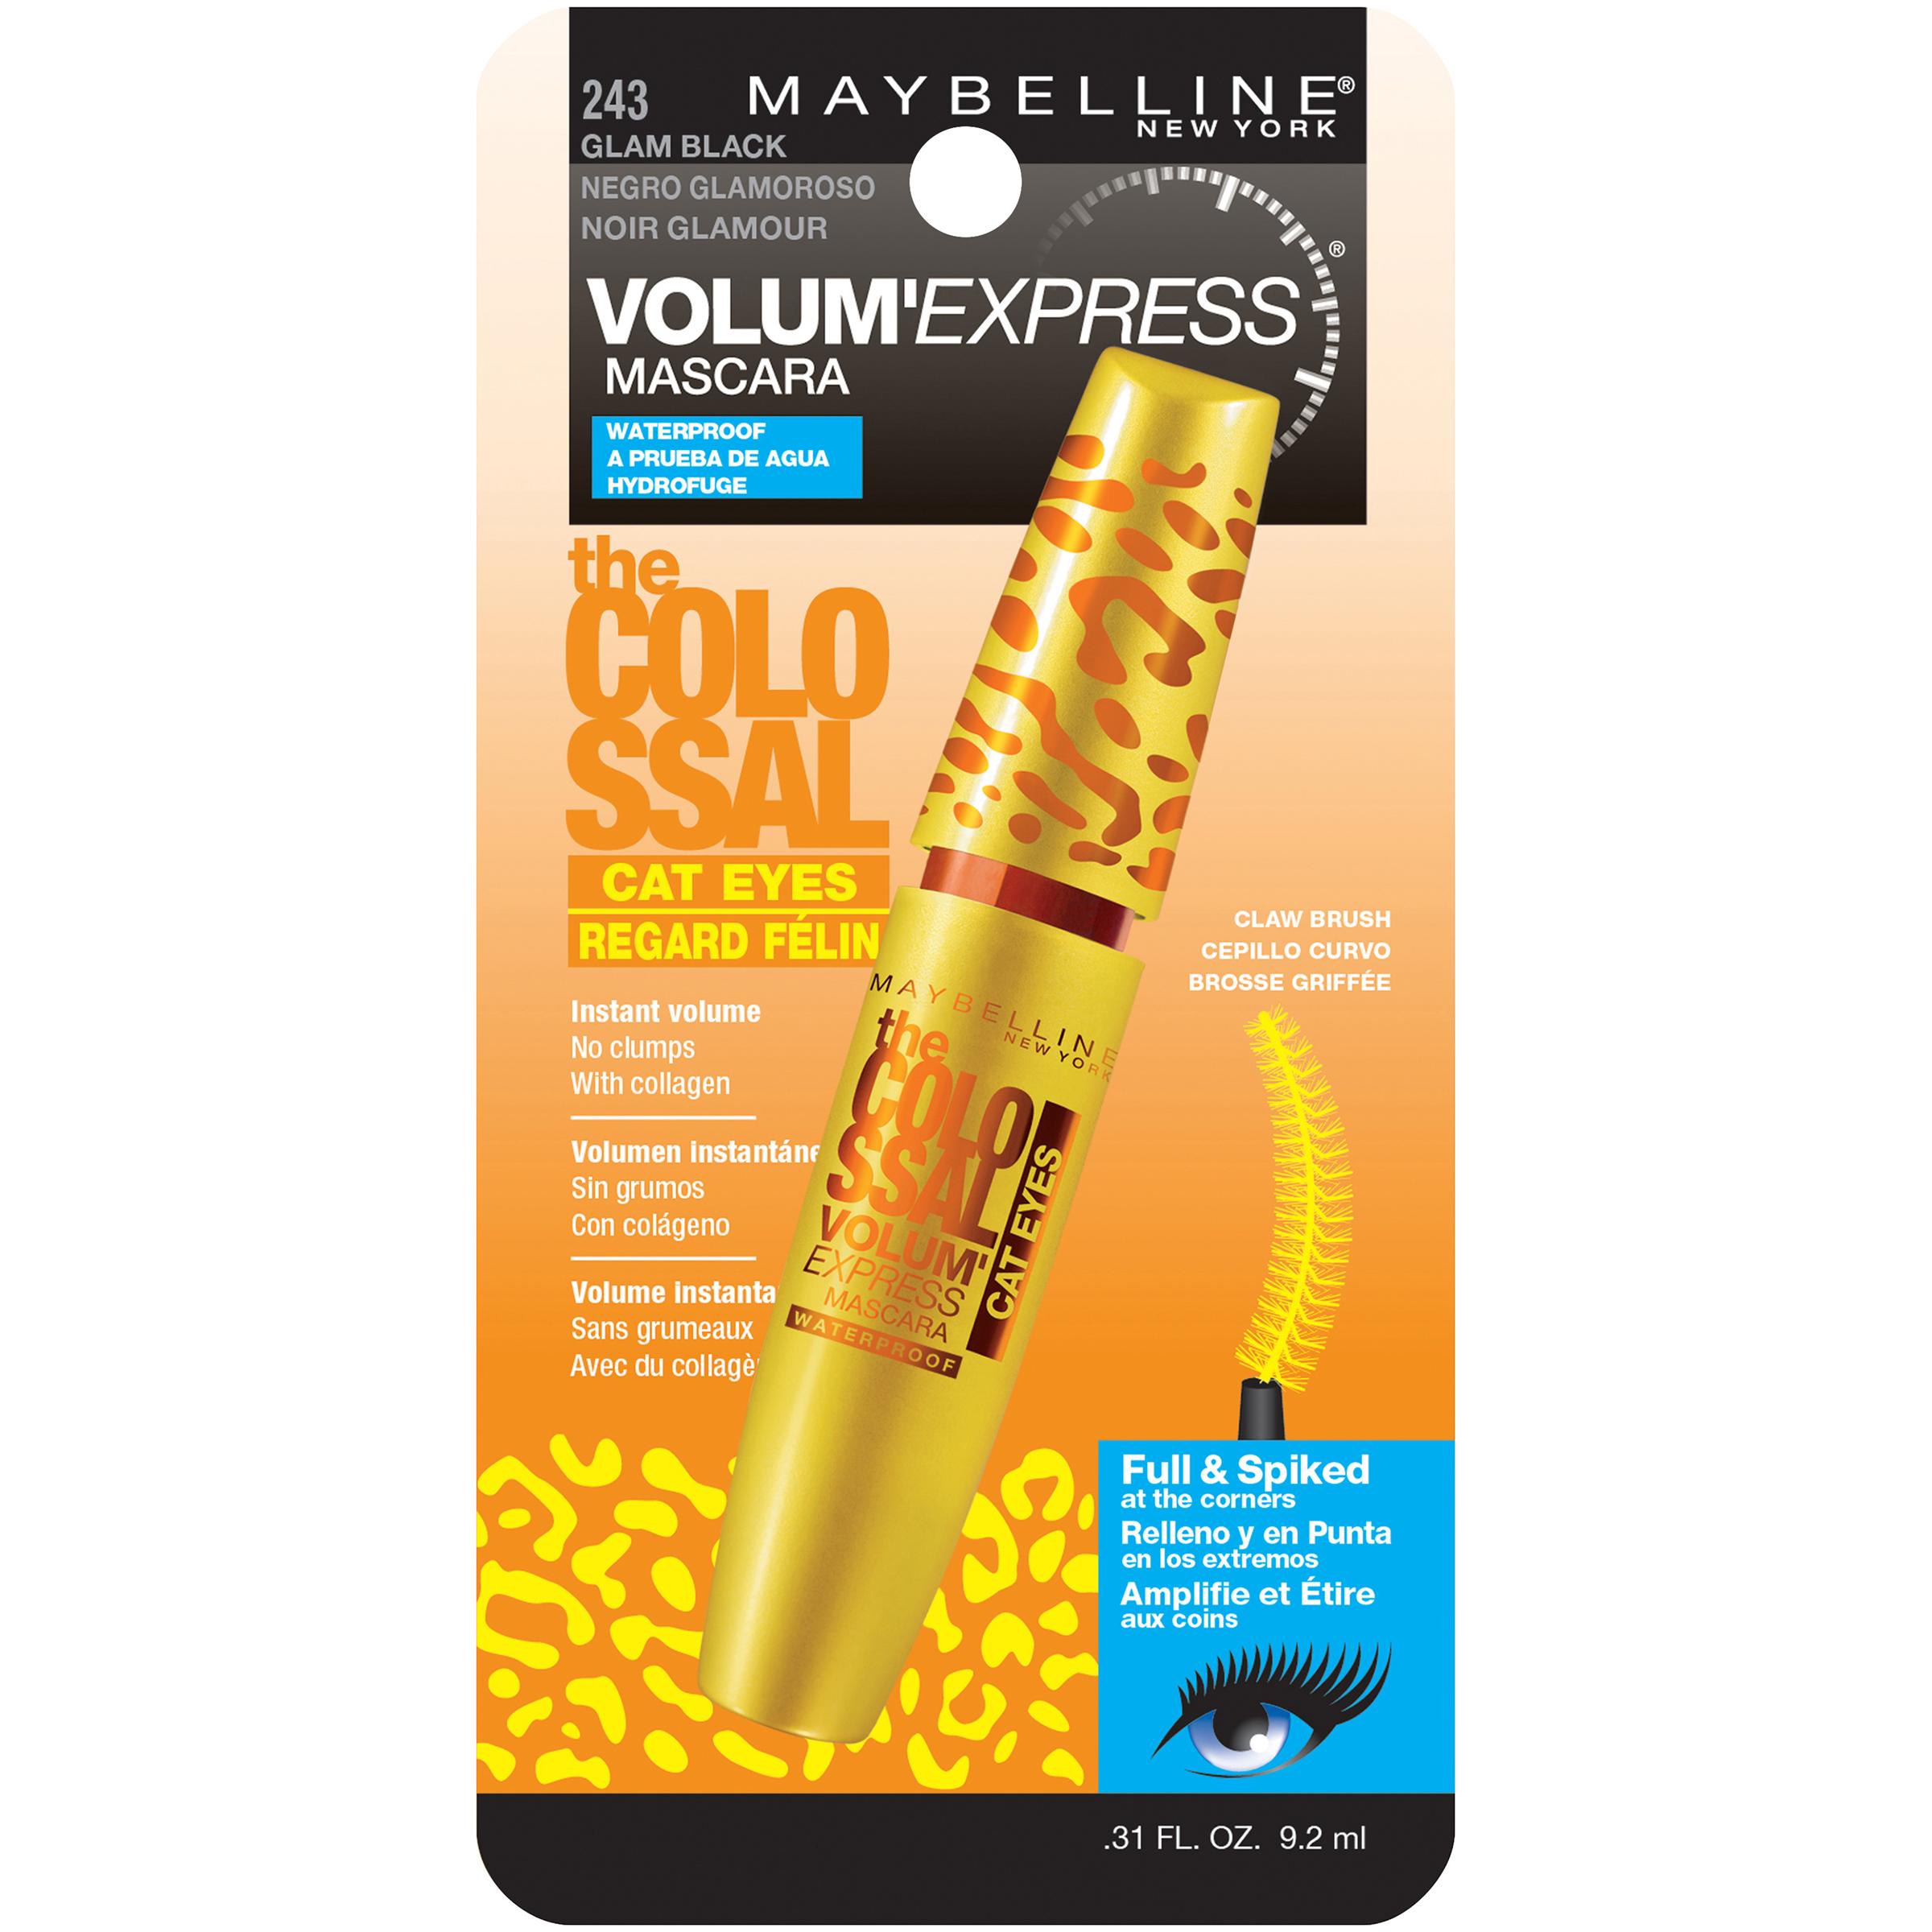 Maybelline New York Volum' Express The Colossal Cat Eyes Mascara, Washable - Glam Black